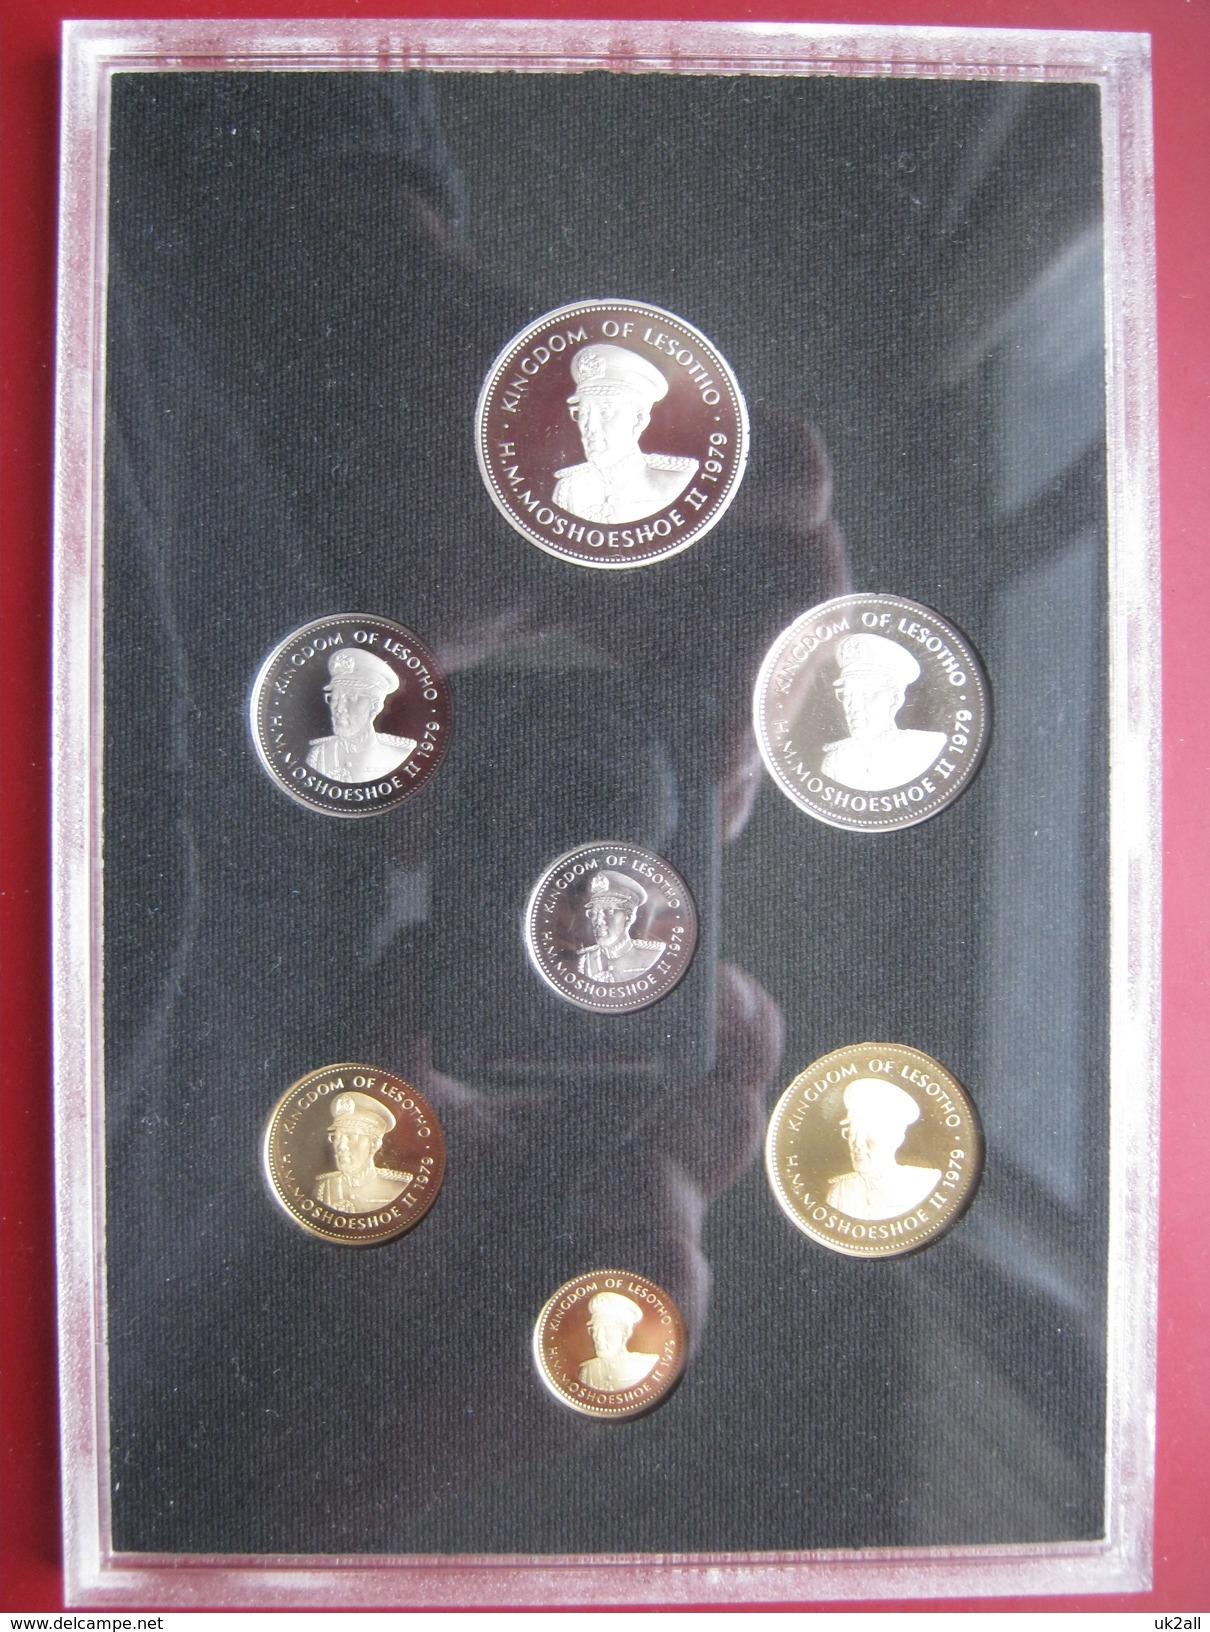 Lesotho 1979 7 Coin Set Proof Royal Mint 1 Lisente - 1 Loti Cased Cased Envelope - Lesotho